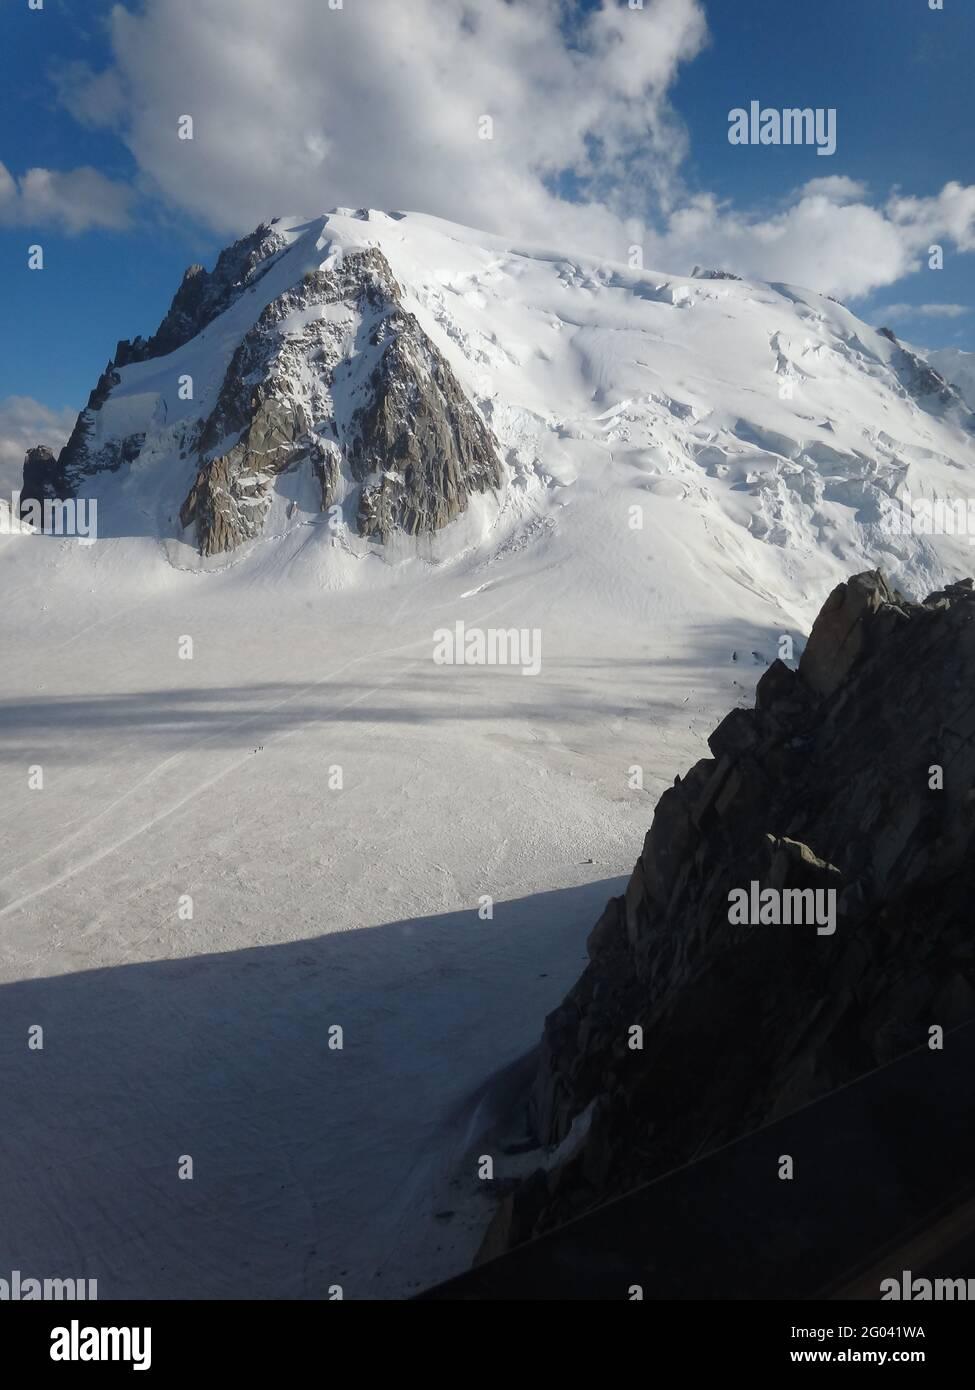 CHAMONIX, FRANCIA - 12 de agosto de 2012: Chamonix-Mont-Blanc / Aiguille du Midi Foto de stock